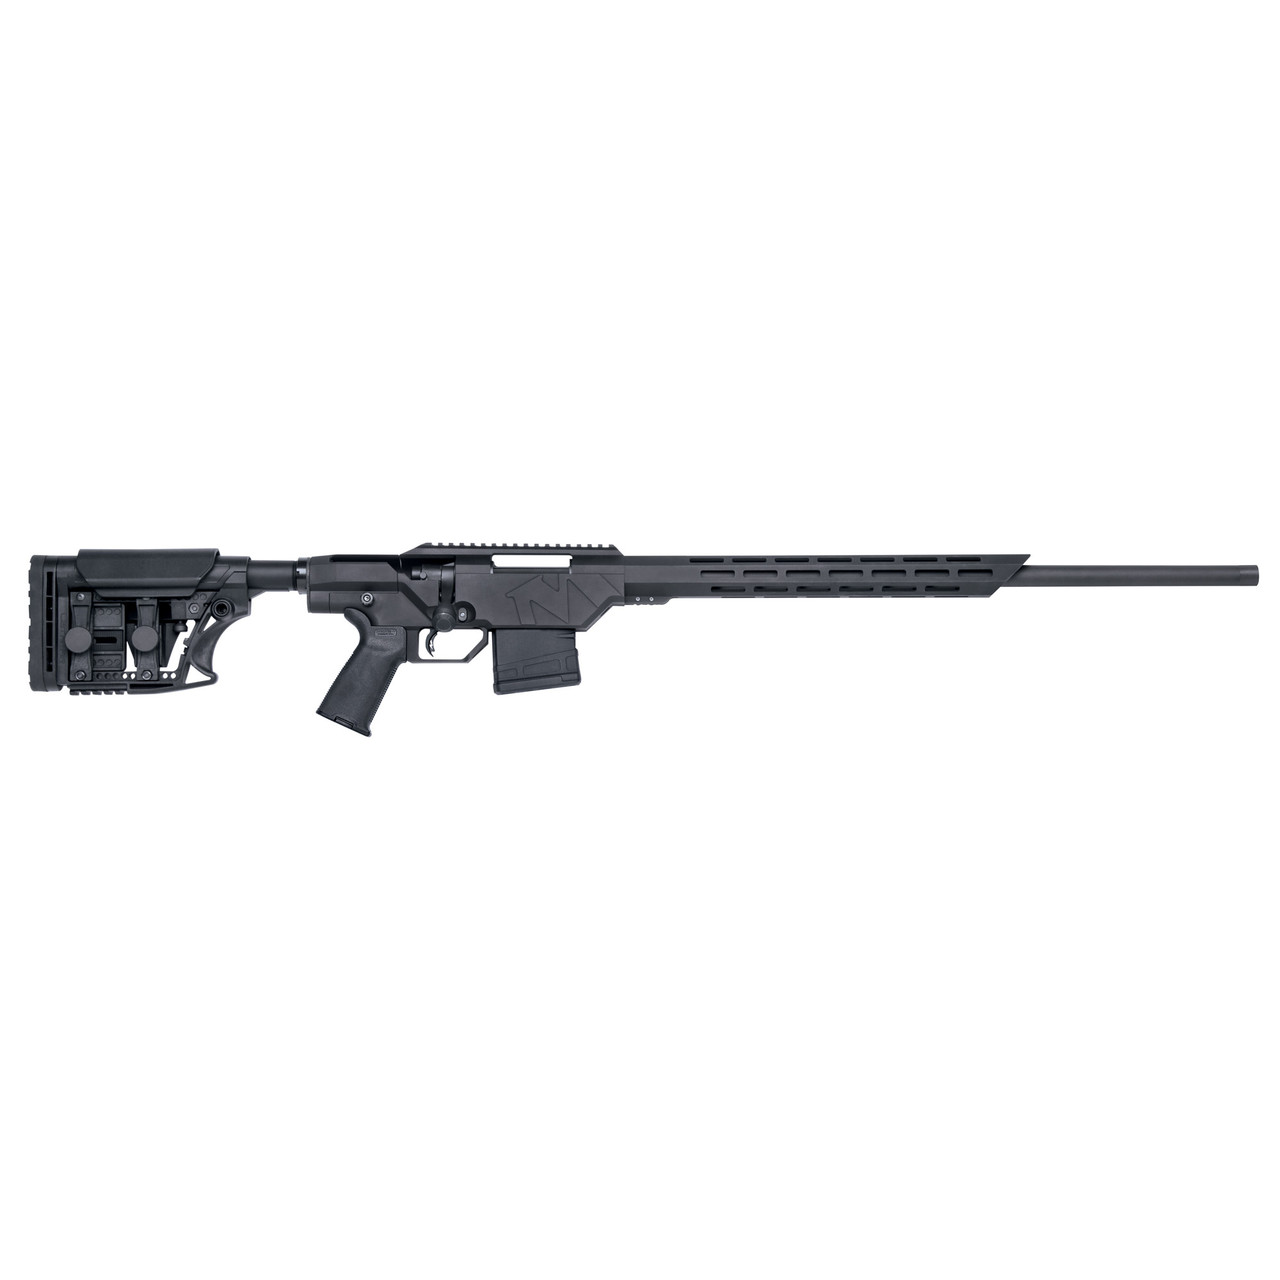 Mossberg MVP Precision Rifle CALIFORNIA LEGAL - 6.5 Creedmoor